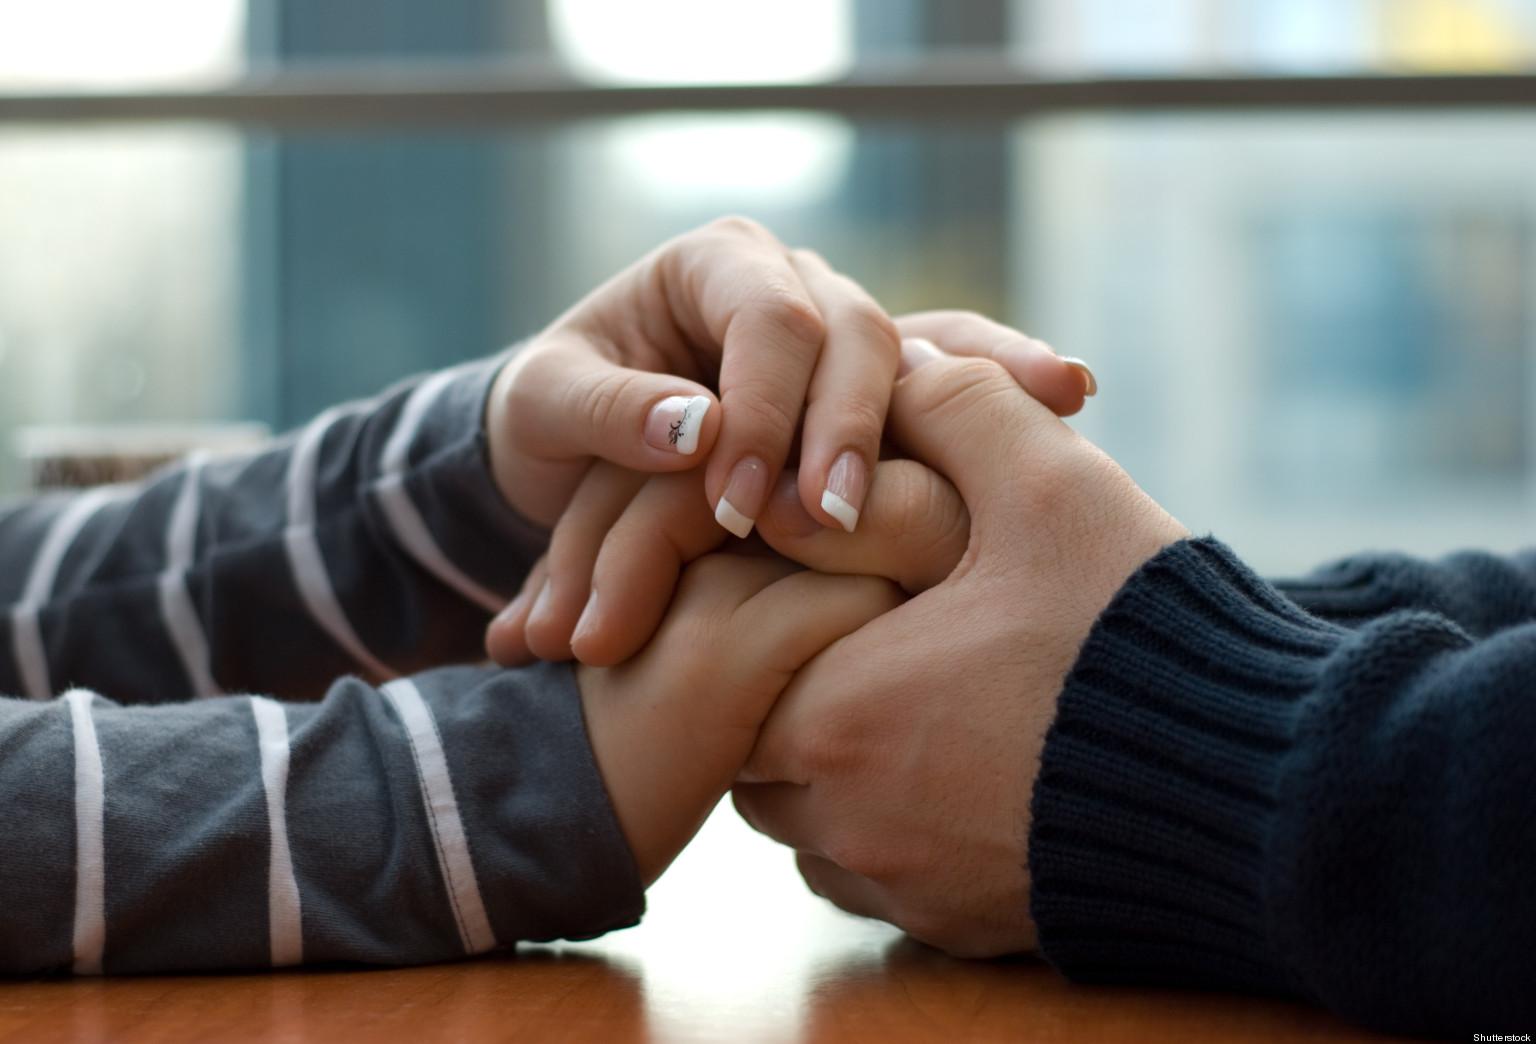 How to avoid an emotional affair